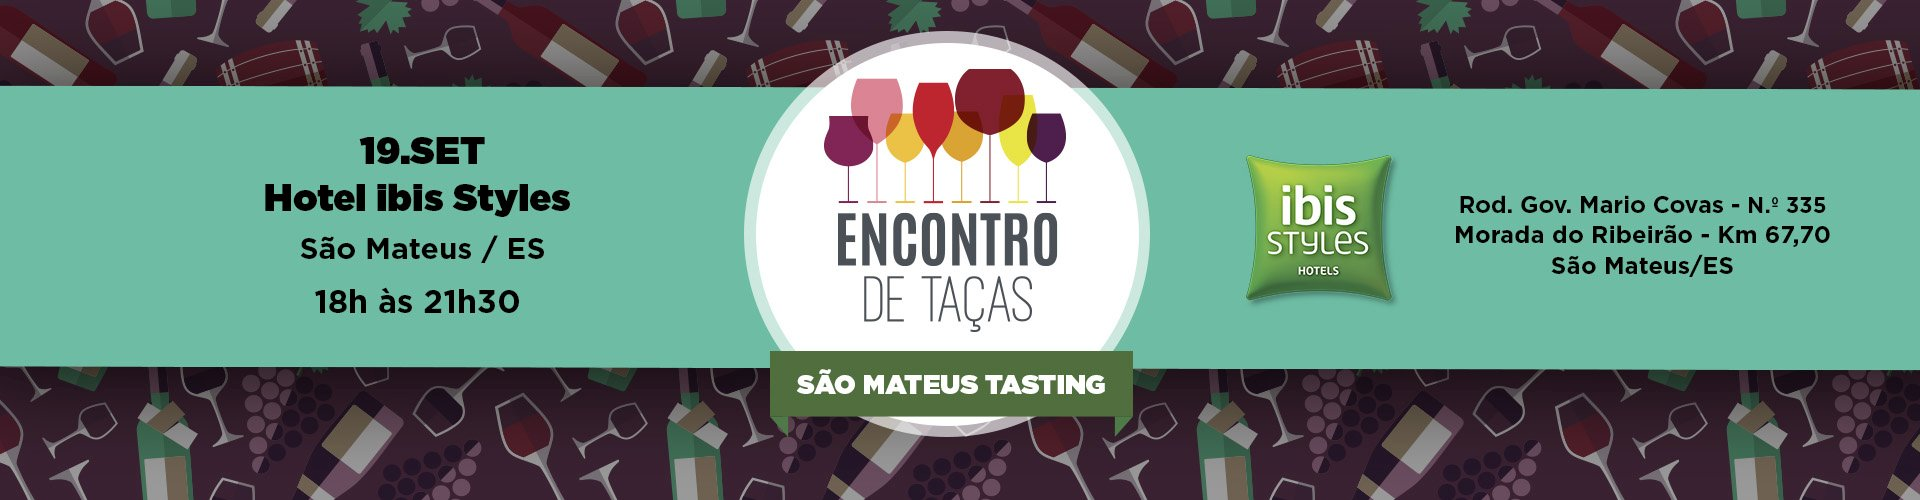 São Mateus Tasting